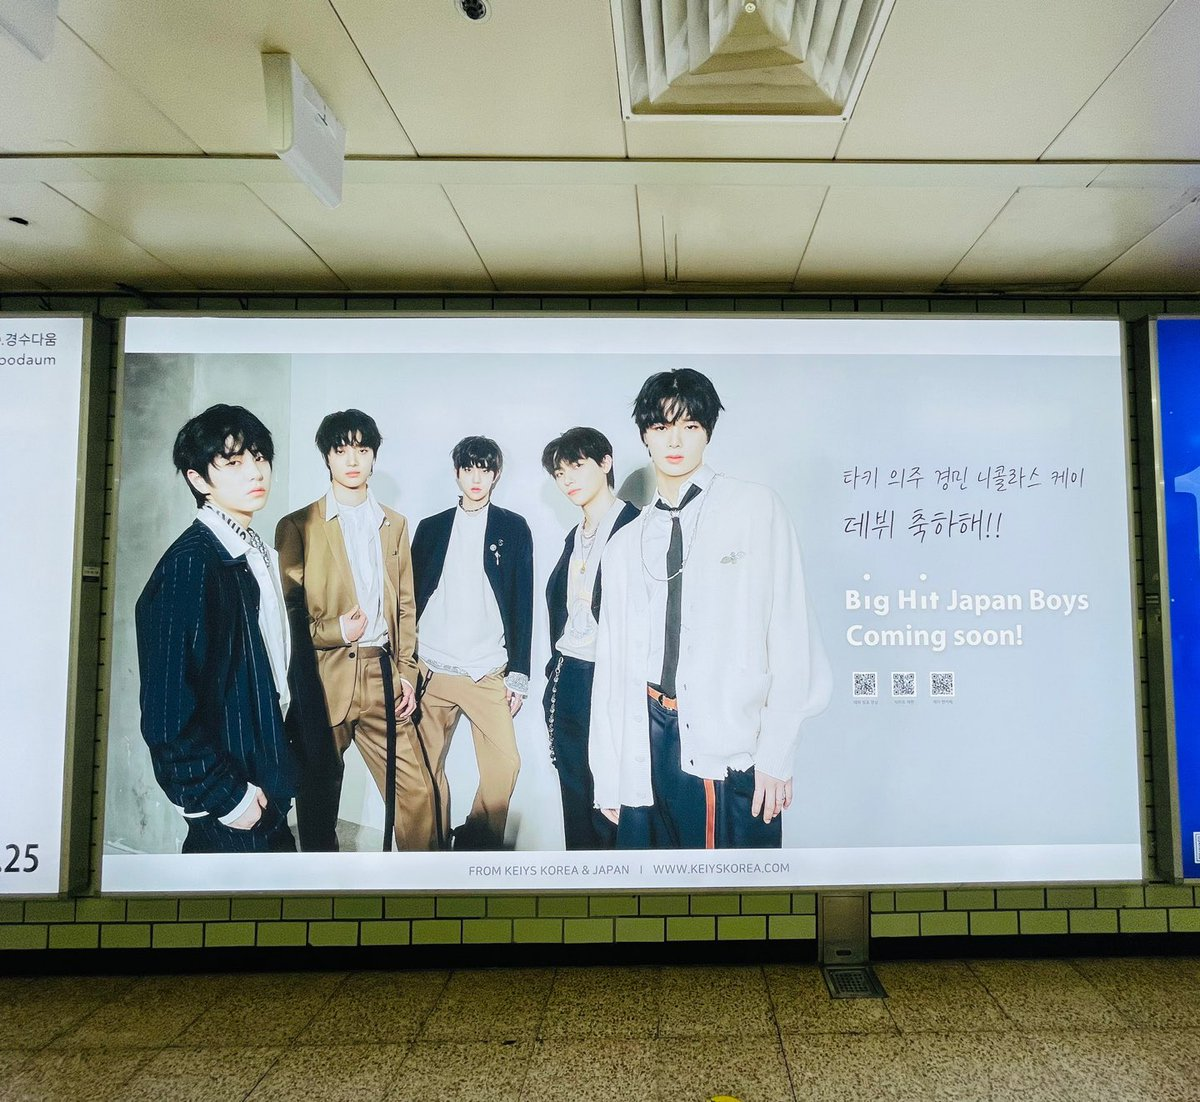 [INFO]   Big Hit Japan Boys ads spotted at Samseong Station! Thank you Keiys Korea & Japan 💚  cr: GGDP_twit #K #NICHOLAS #EJ  #KYUNGMIN #TAKI  #빅히트재팬 #BigHitJP_Boys